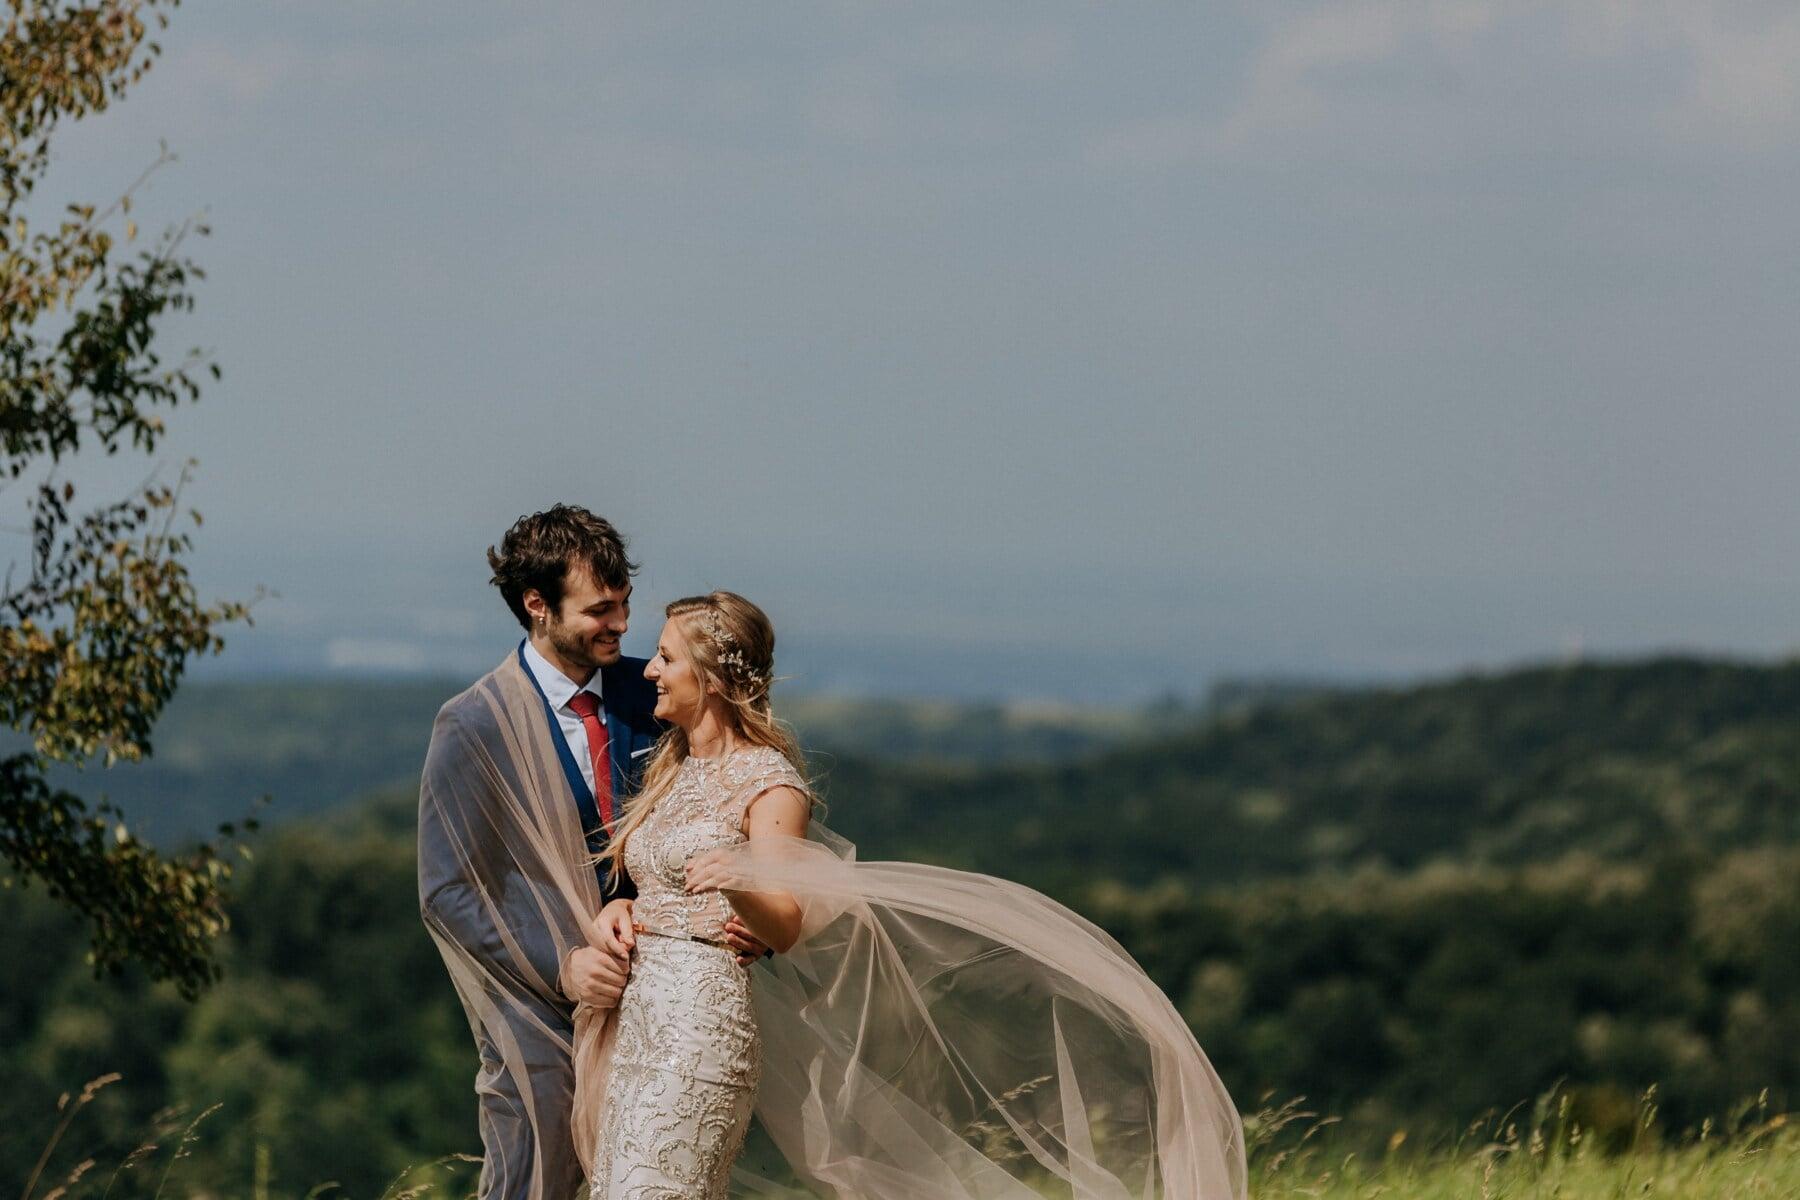 romantic, love date, veil, hike, hiker, wedding, groom, love, girl, engagement